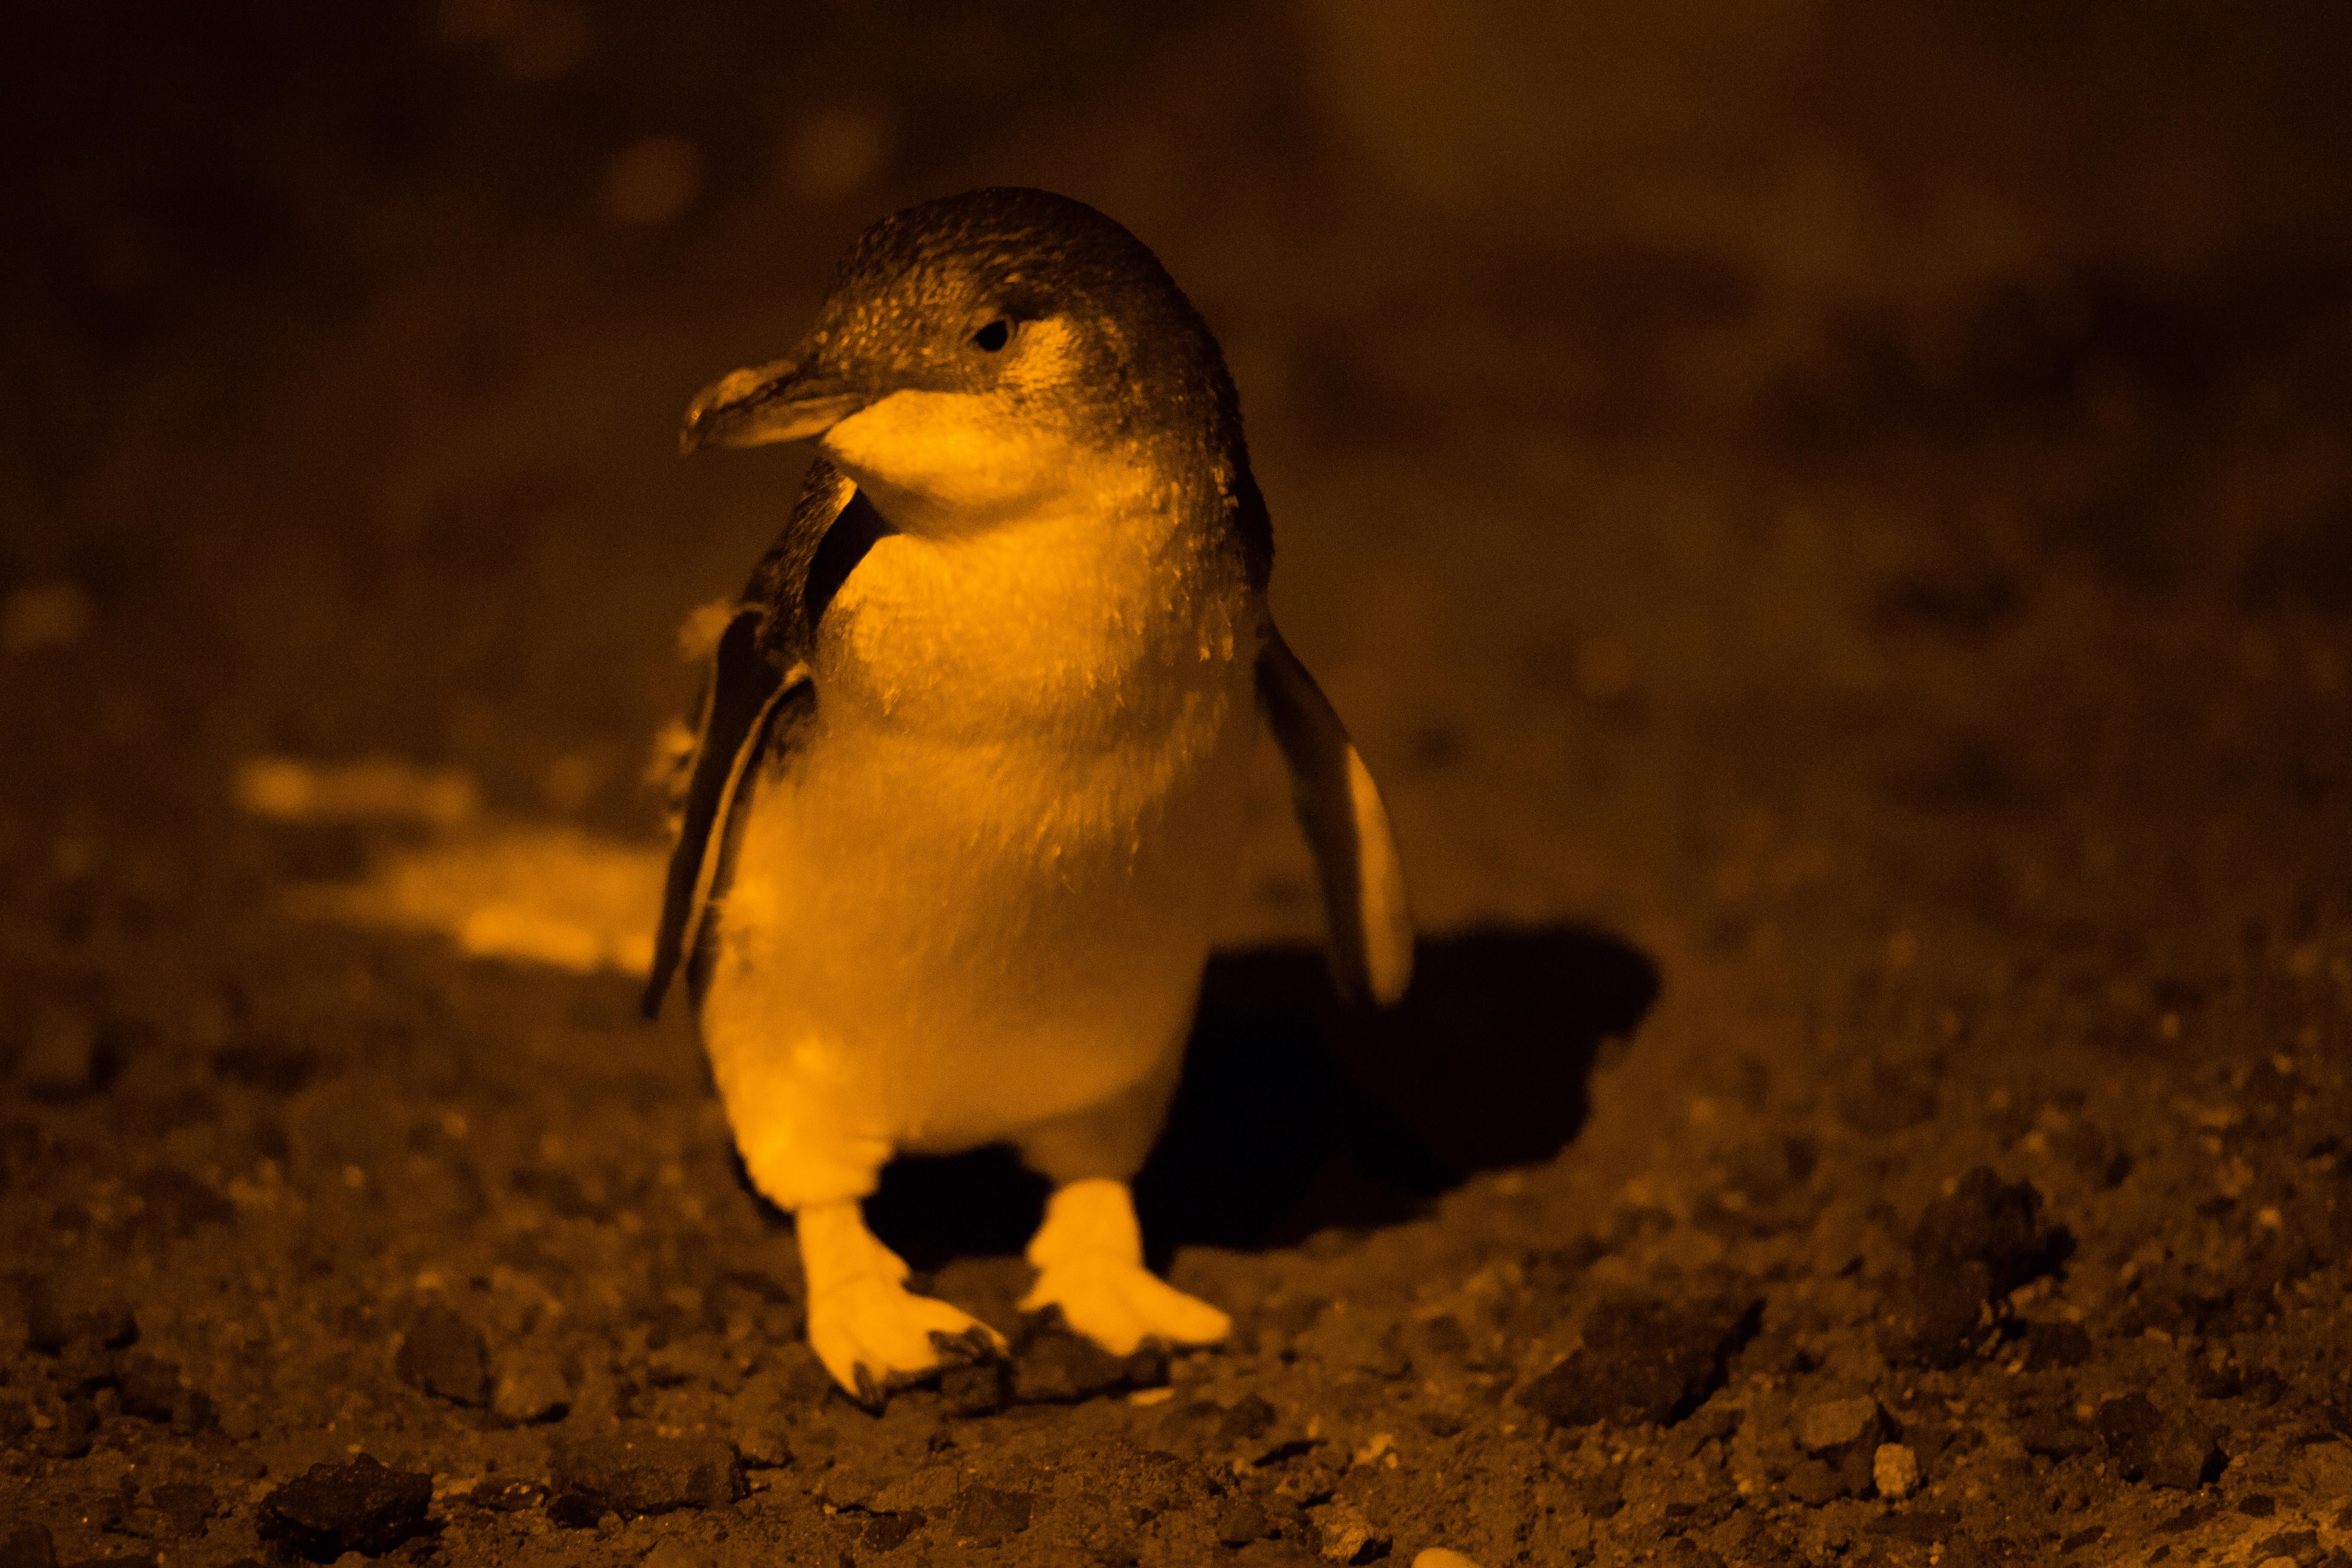 Manchots-St-Kilda-fairy-penguins-3